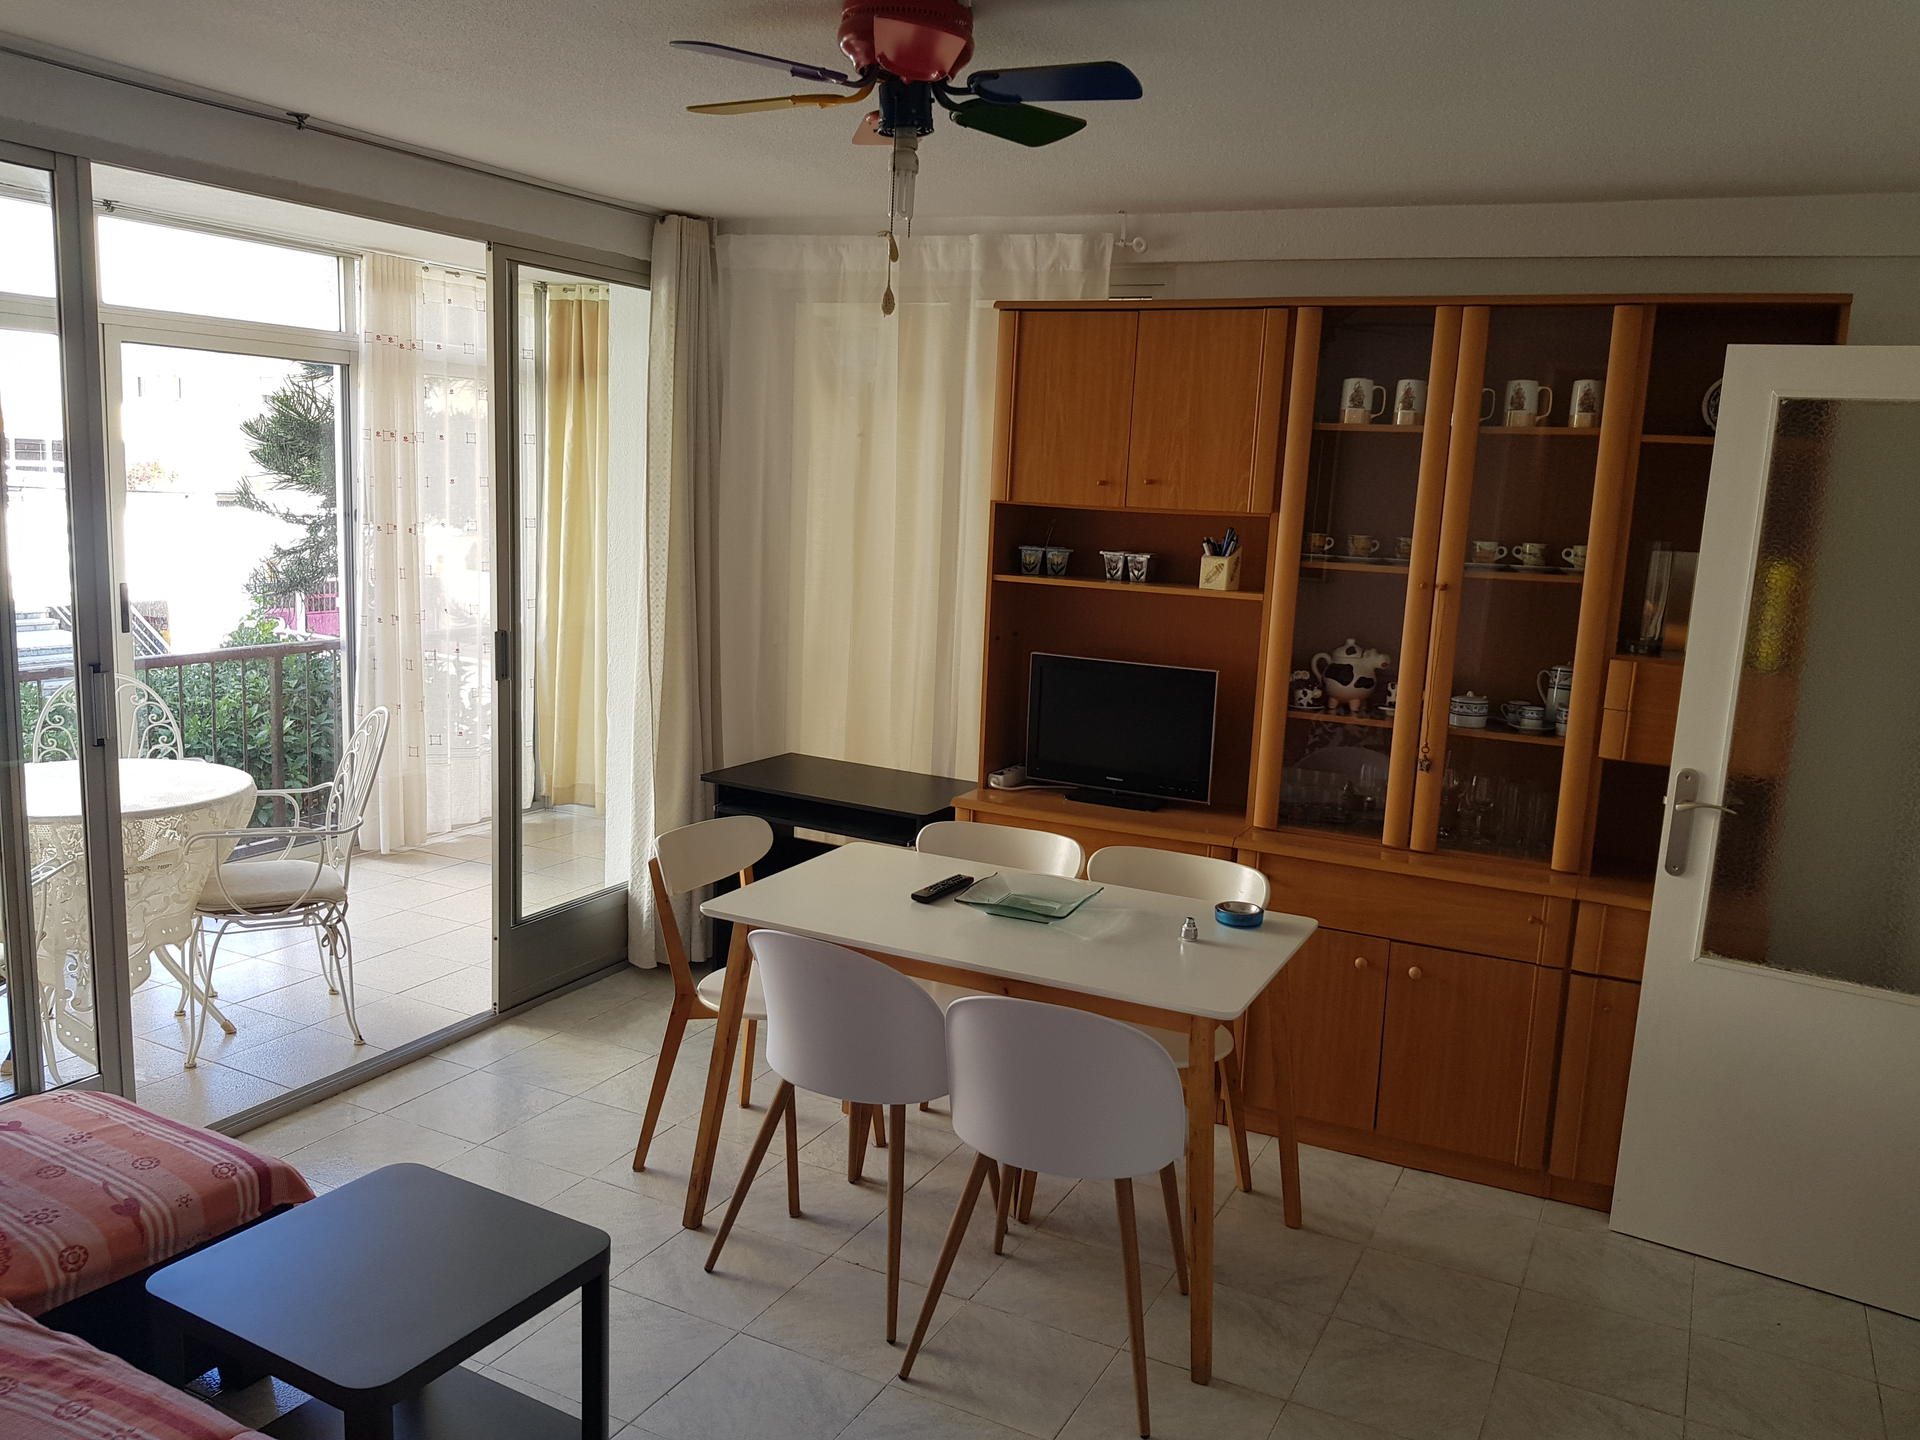 Piso -                                       Benidorm -                                       3 dormitorios -                                       0 ocupantes